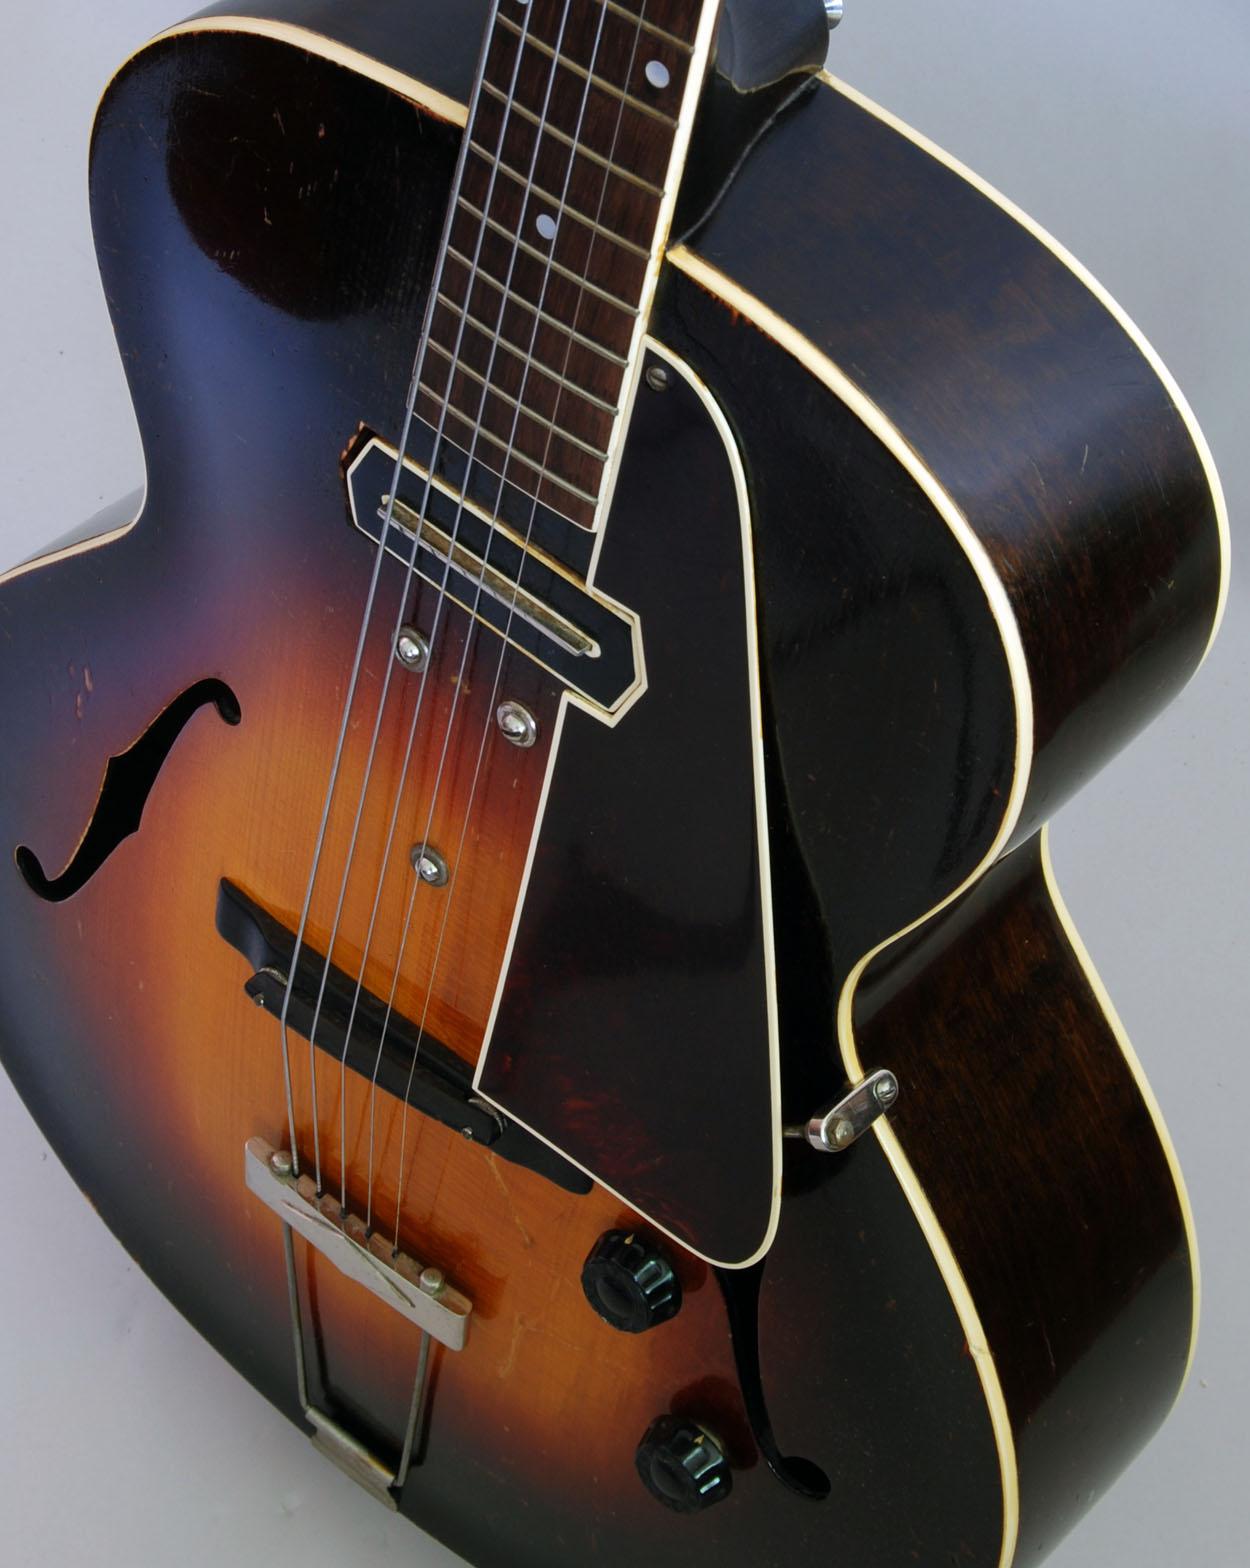 E S S E N T I A L: Gibson ES-150 Guitar For Sale